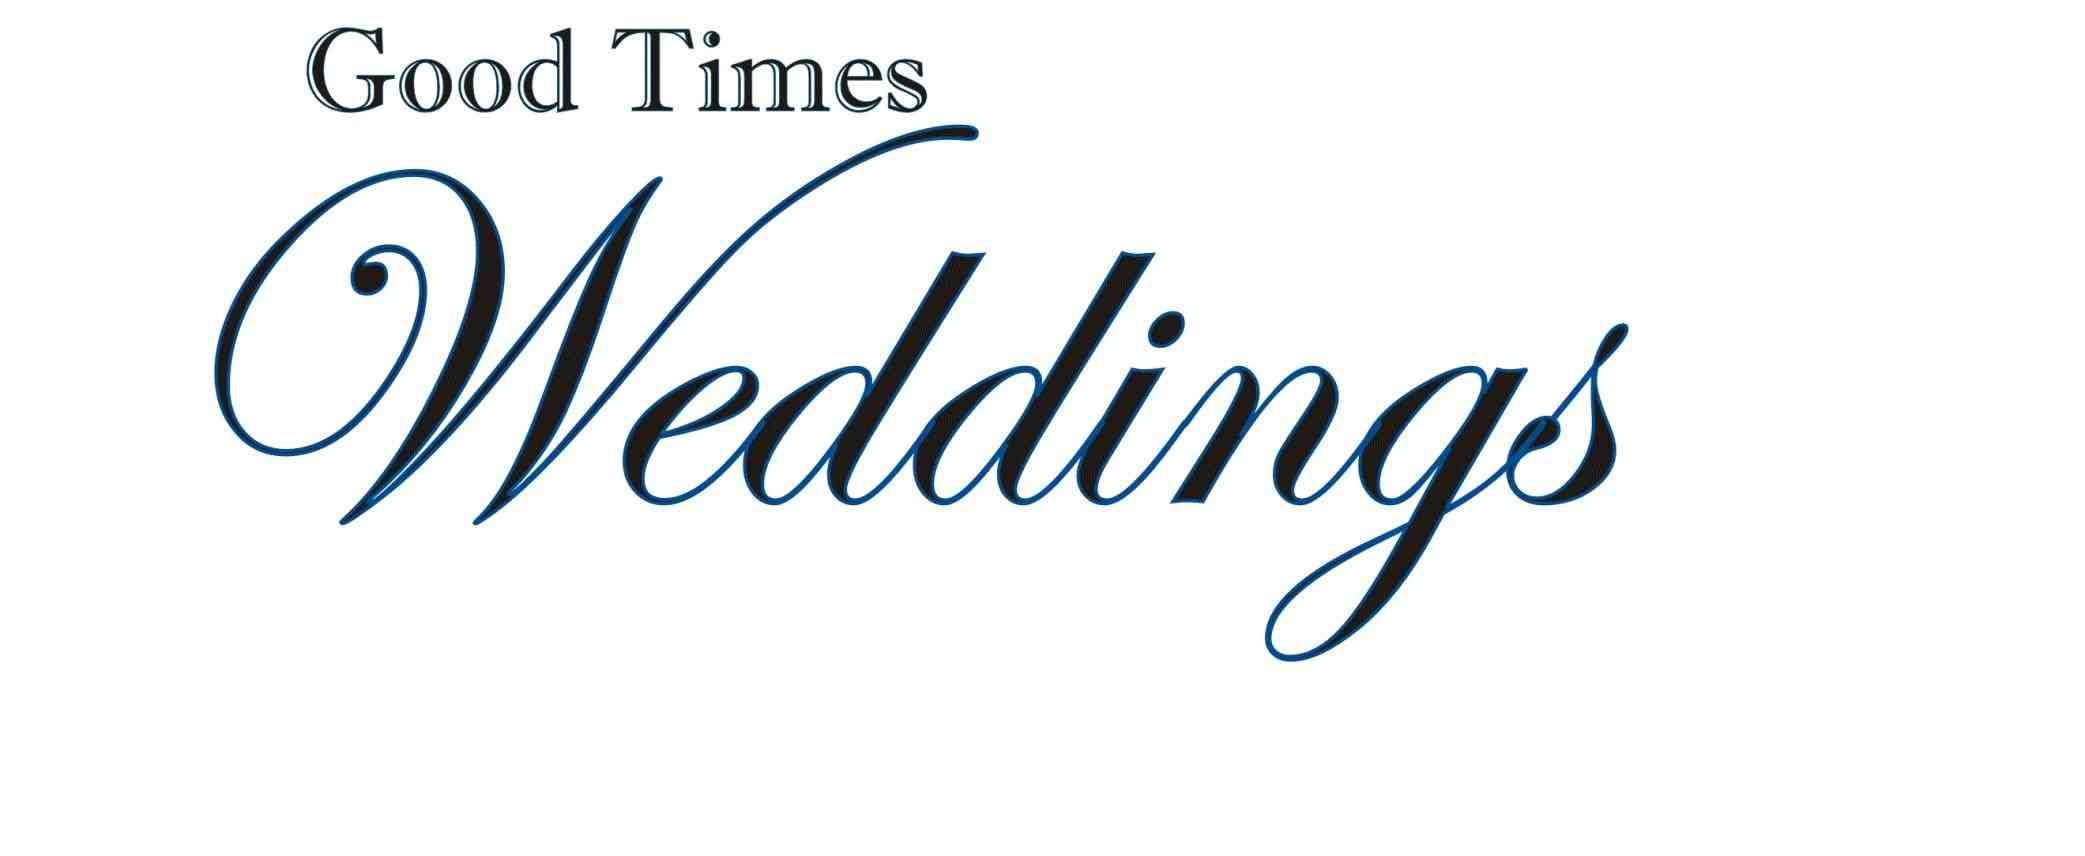 Victorian reception s free. 2017 clipart wedding